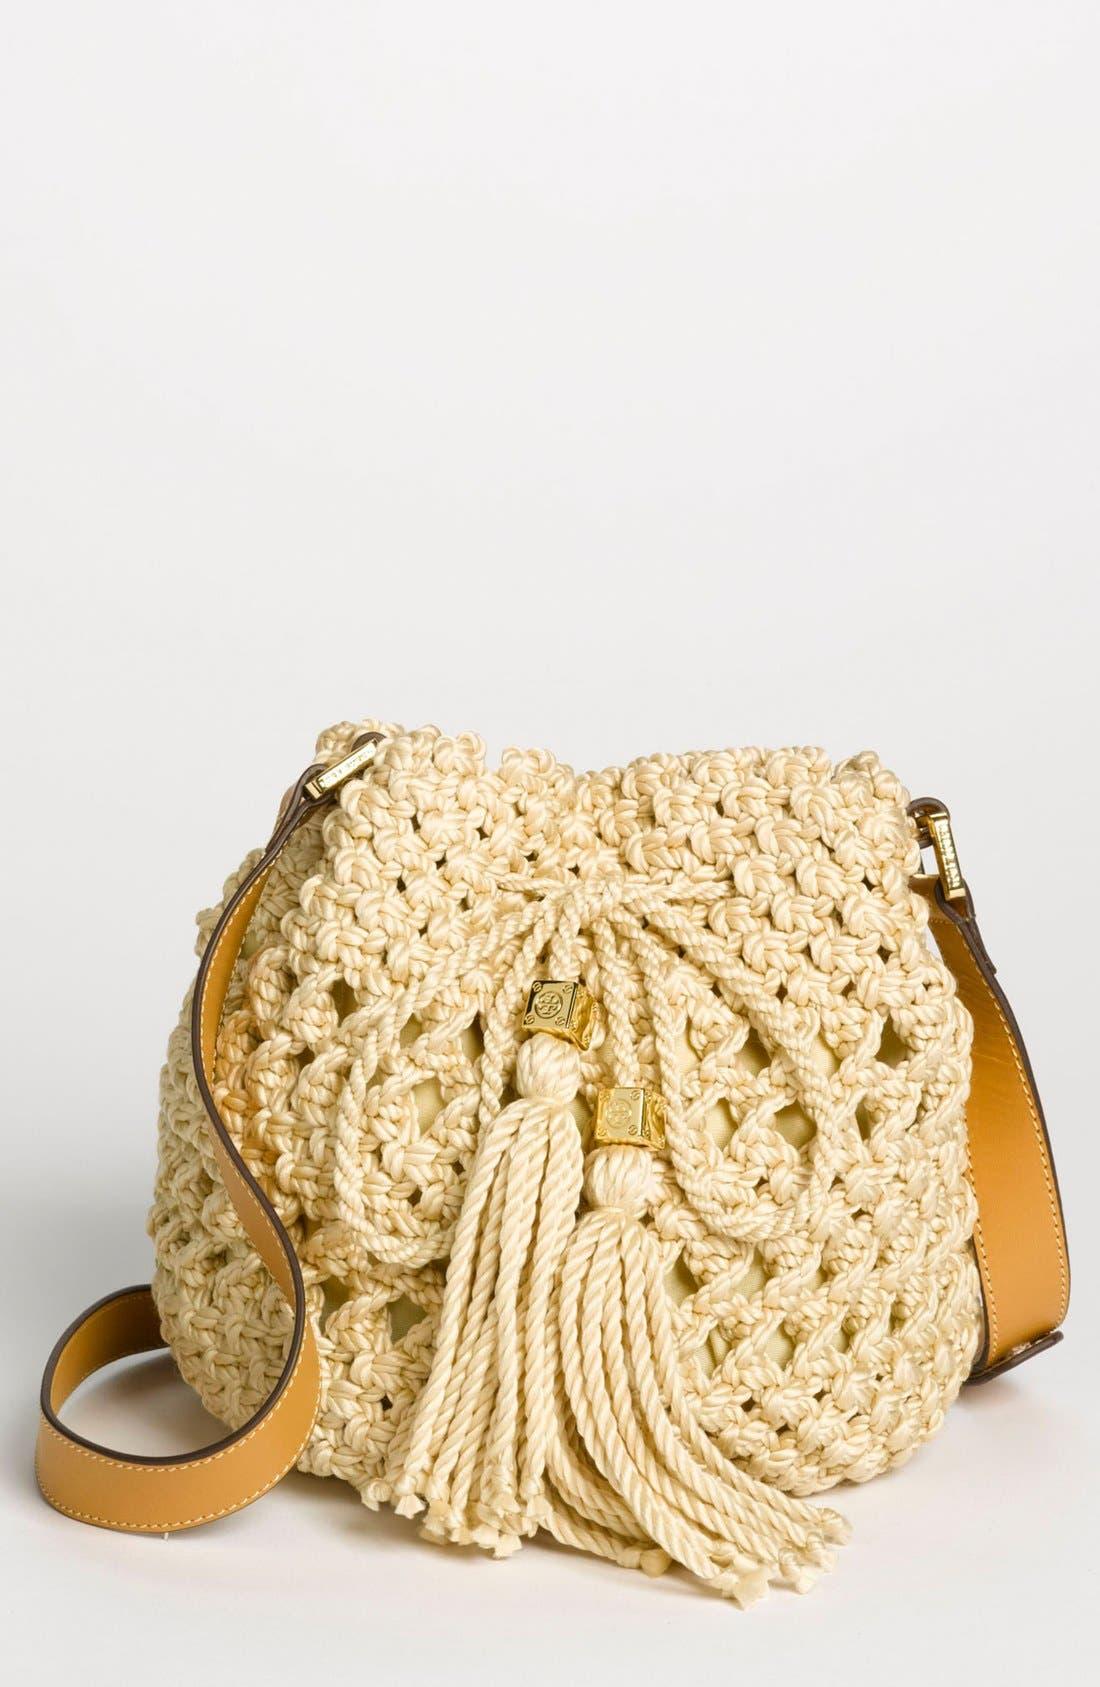 Alternate Image 1 Selected - Tory Burch 'Dawson - Small' Crocheted Bucket Bag